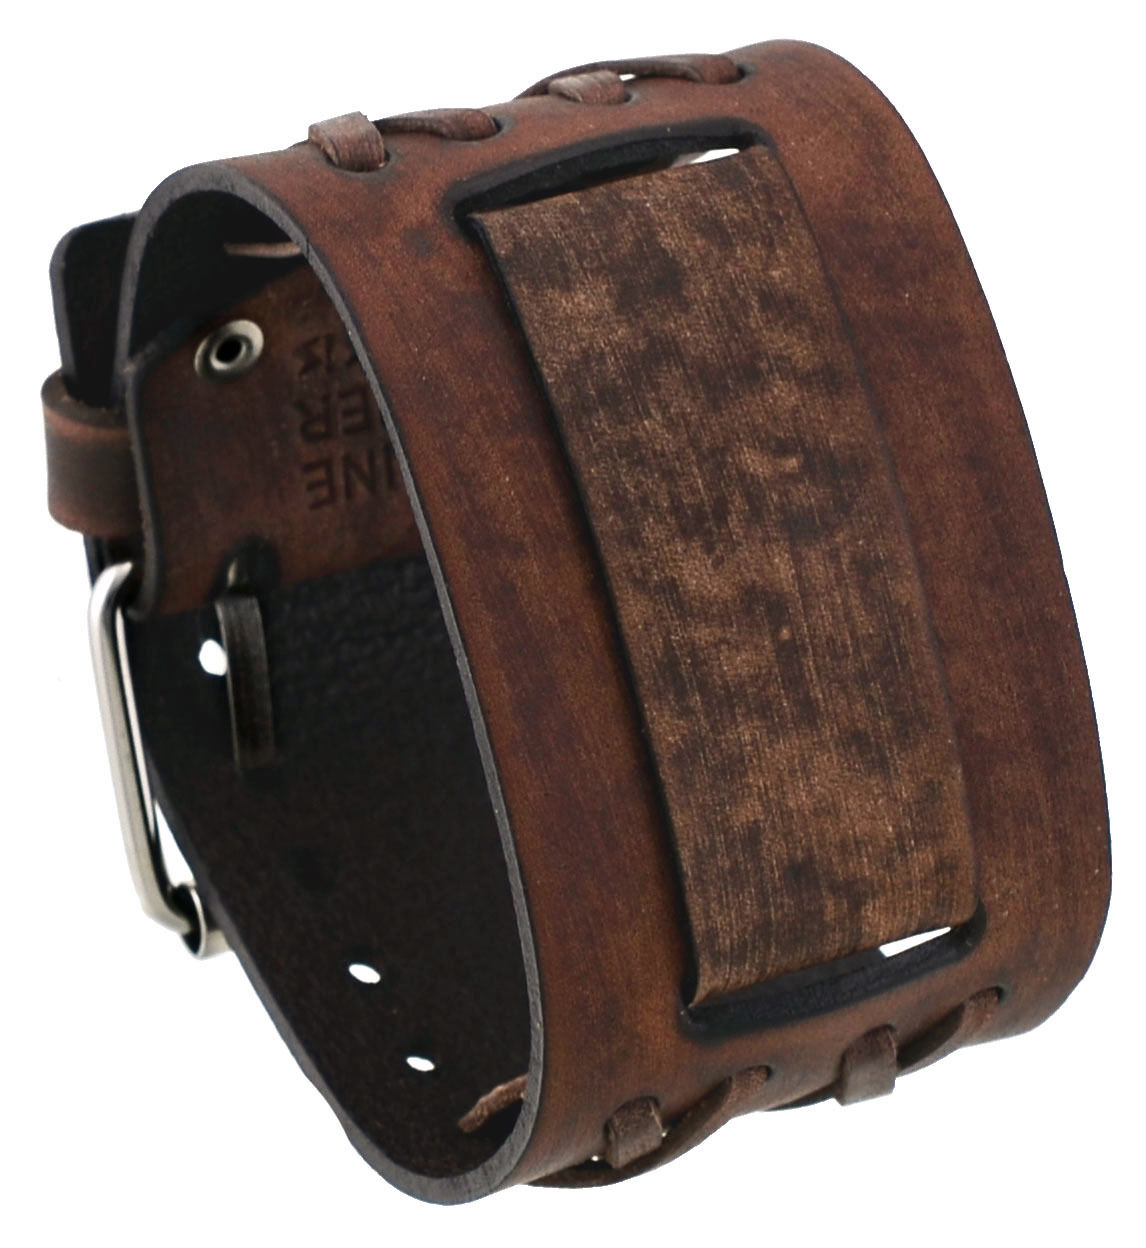 Nemesis DXB-B Criss Cross Pattern Wide Moro Brown Leather Cuff Wrist Watch Band by